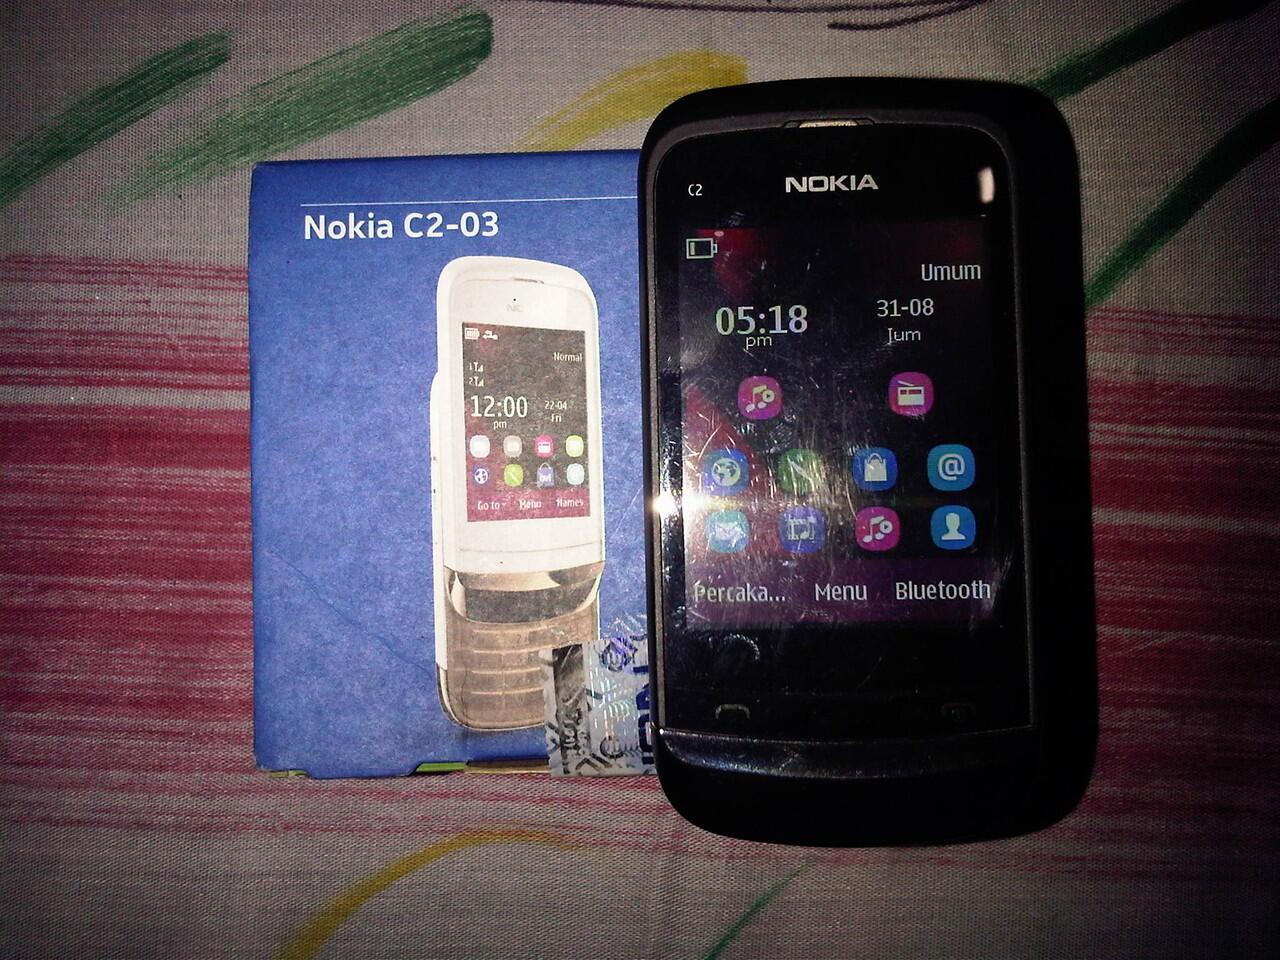 Nokia c2 - 03 Garansi Resmi Nokia. MURAH GAN!!!